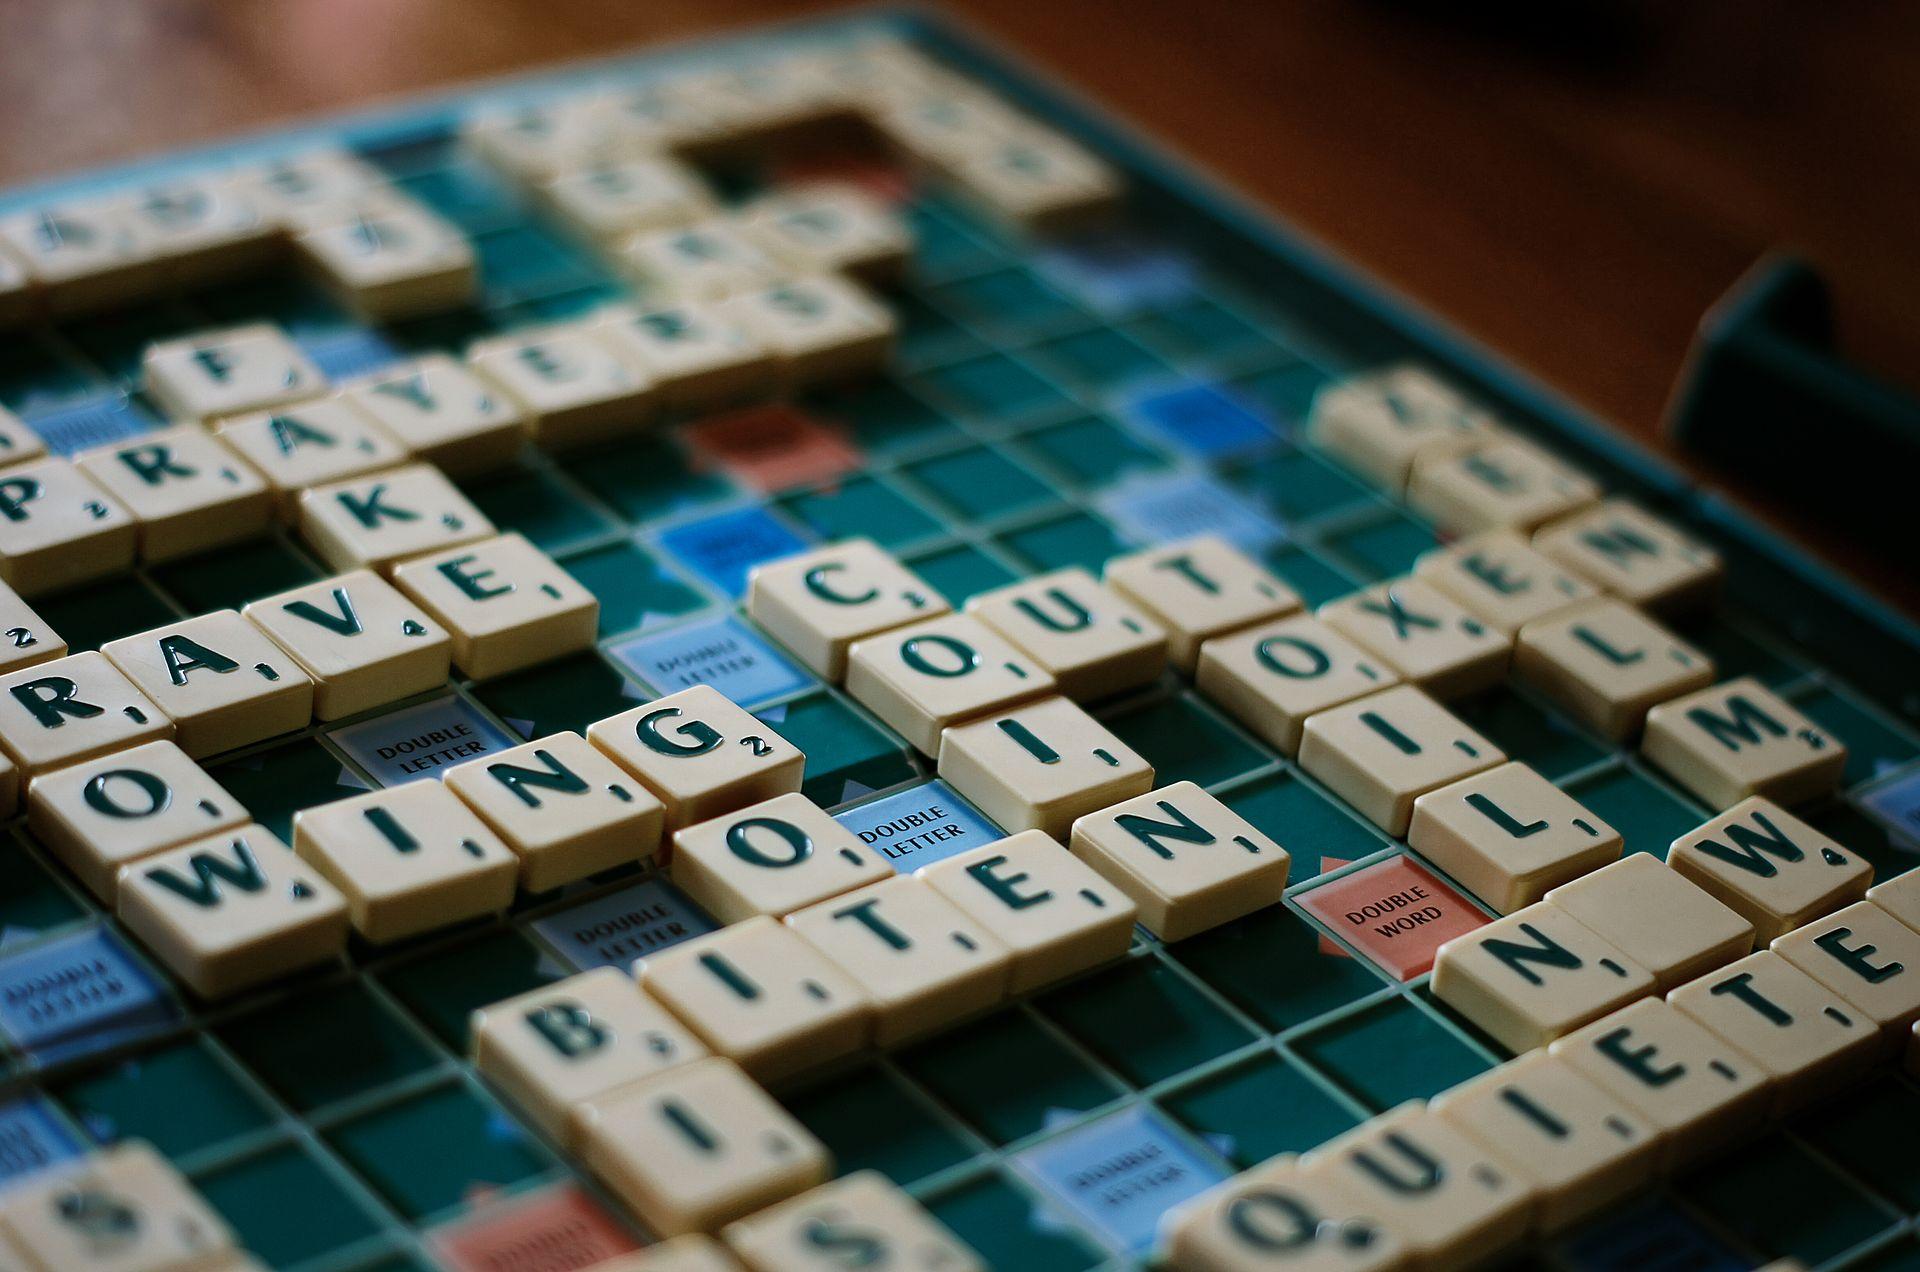 Scrabbl